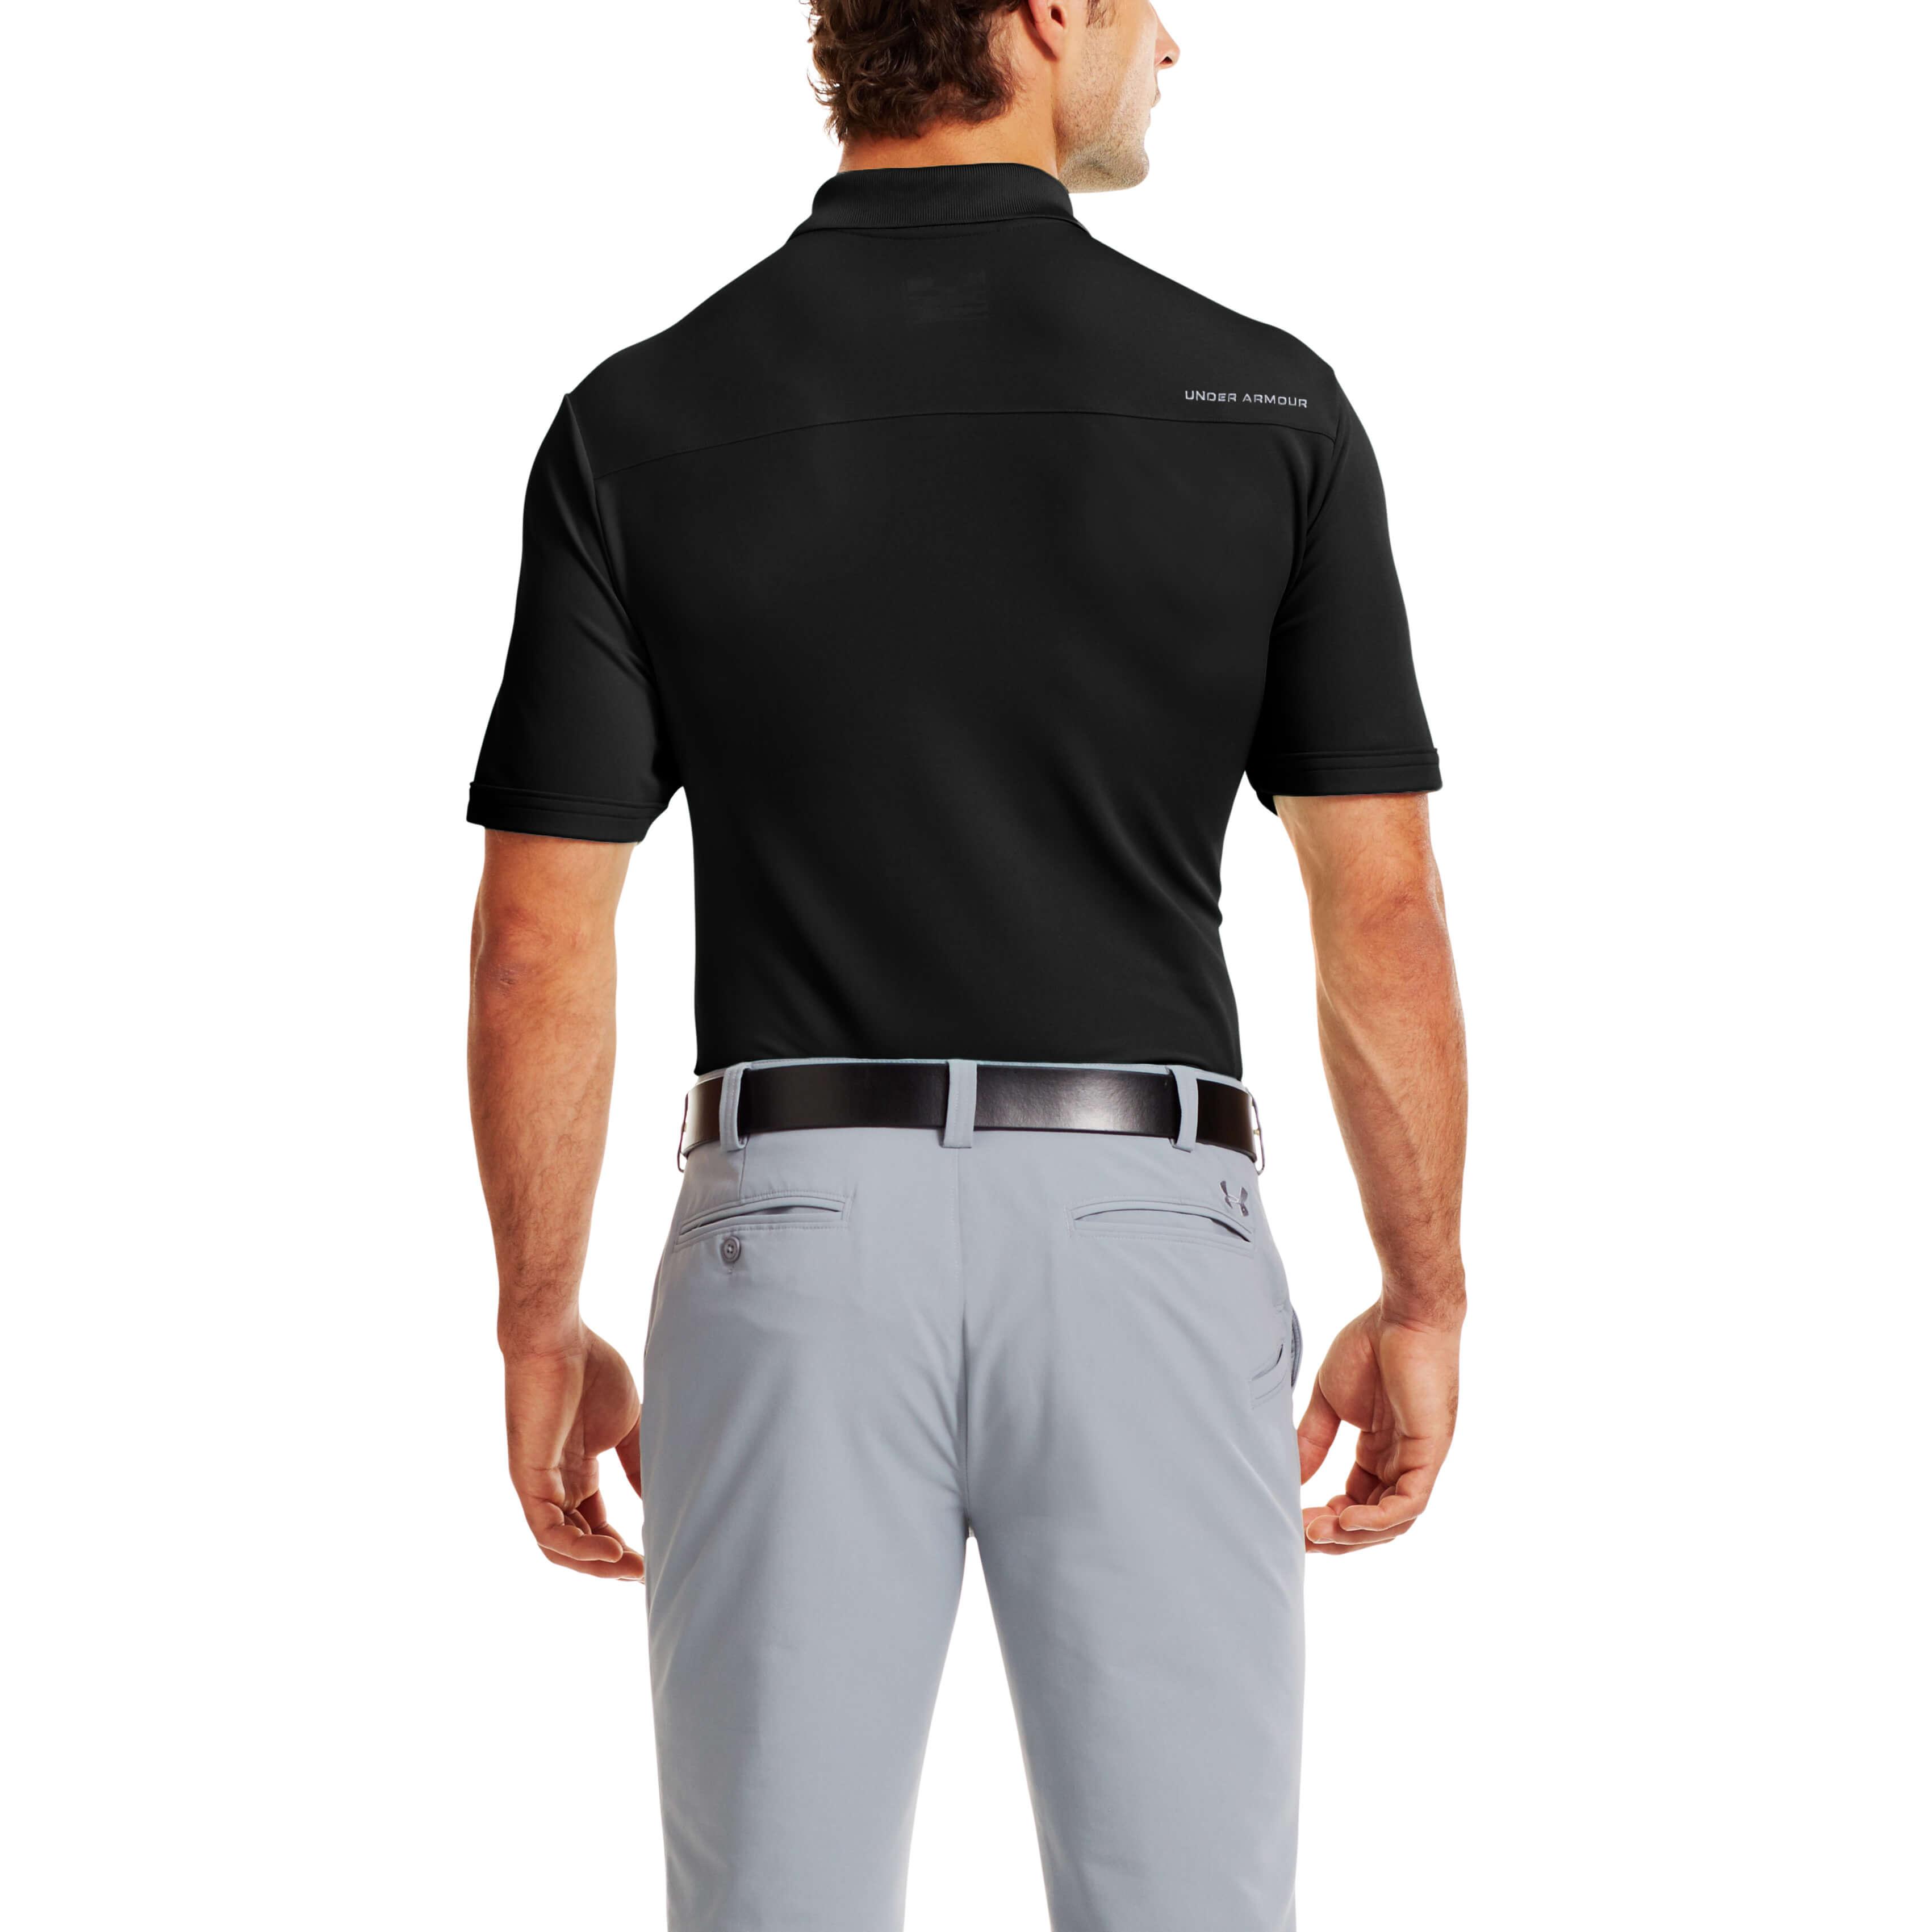 Under-Armour-Mens-Medal-Play-Performance-Polo-Shirt-UA-Golf-Short-Sleeve thumbnail 10